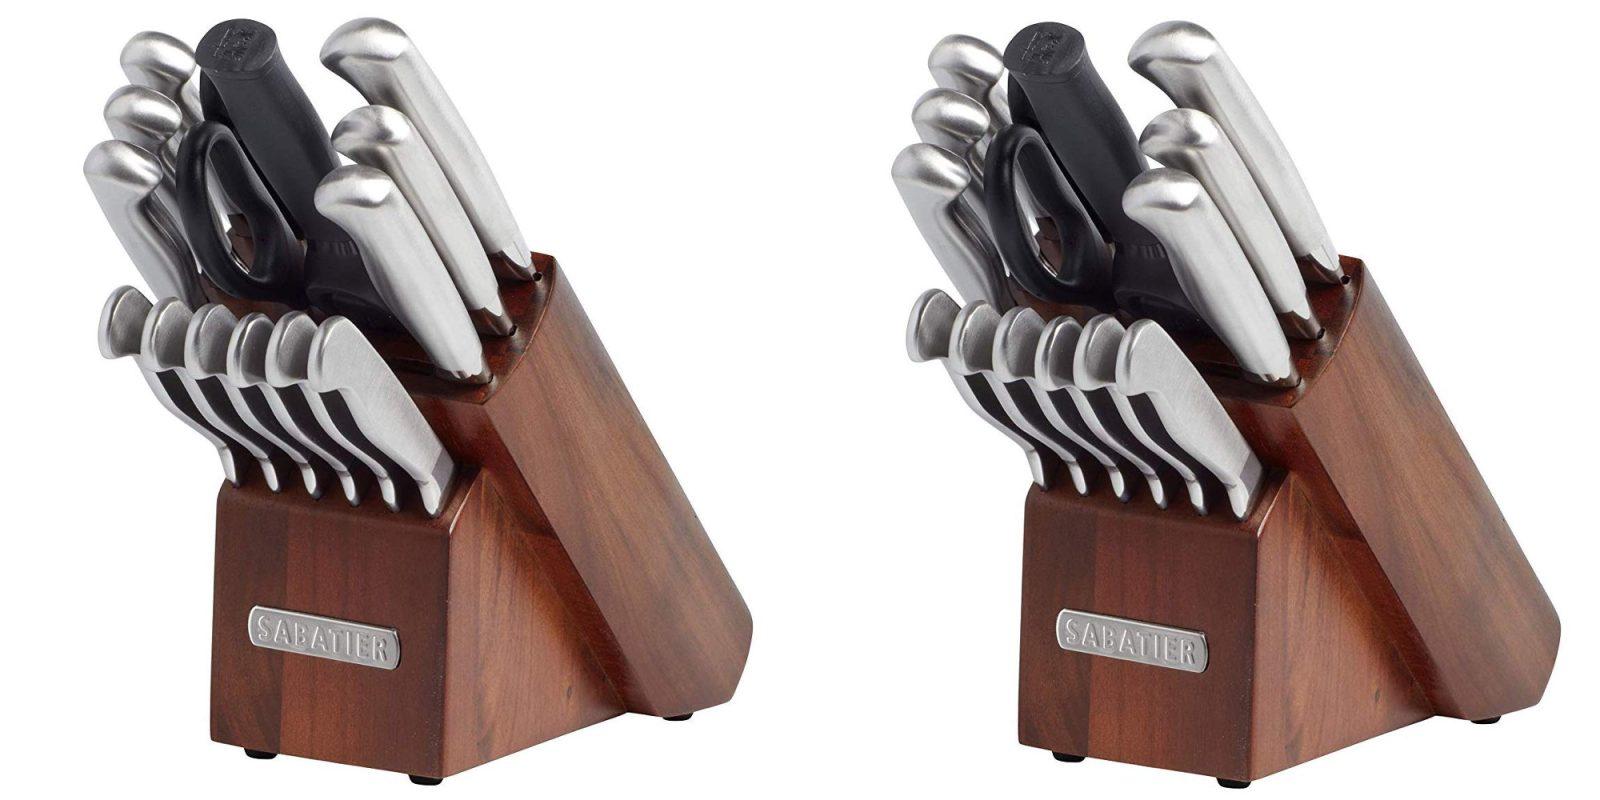 Sabatier's 15-Piece Steel Acacia Wood Knife Block Set for $46 (Reg. up to $89)